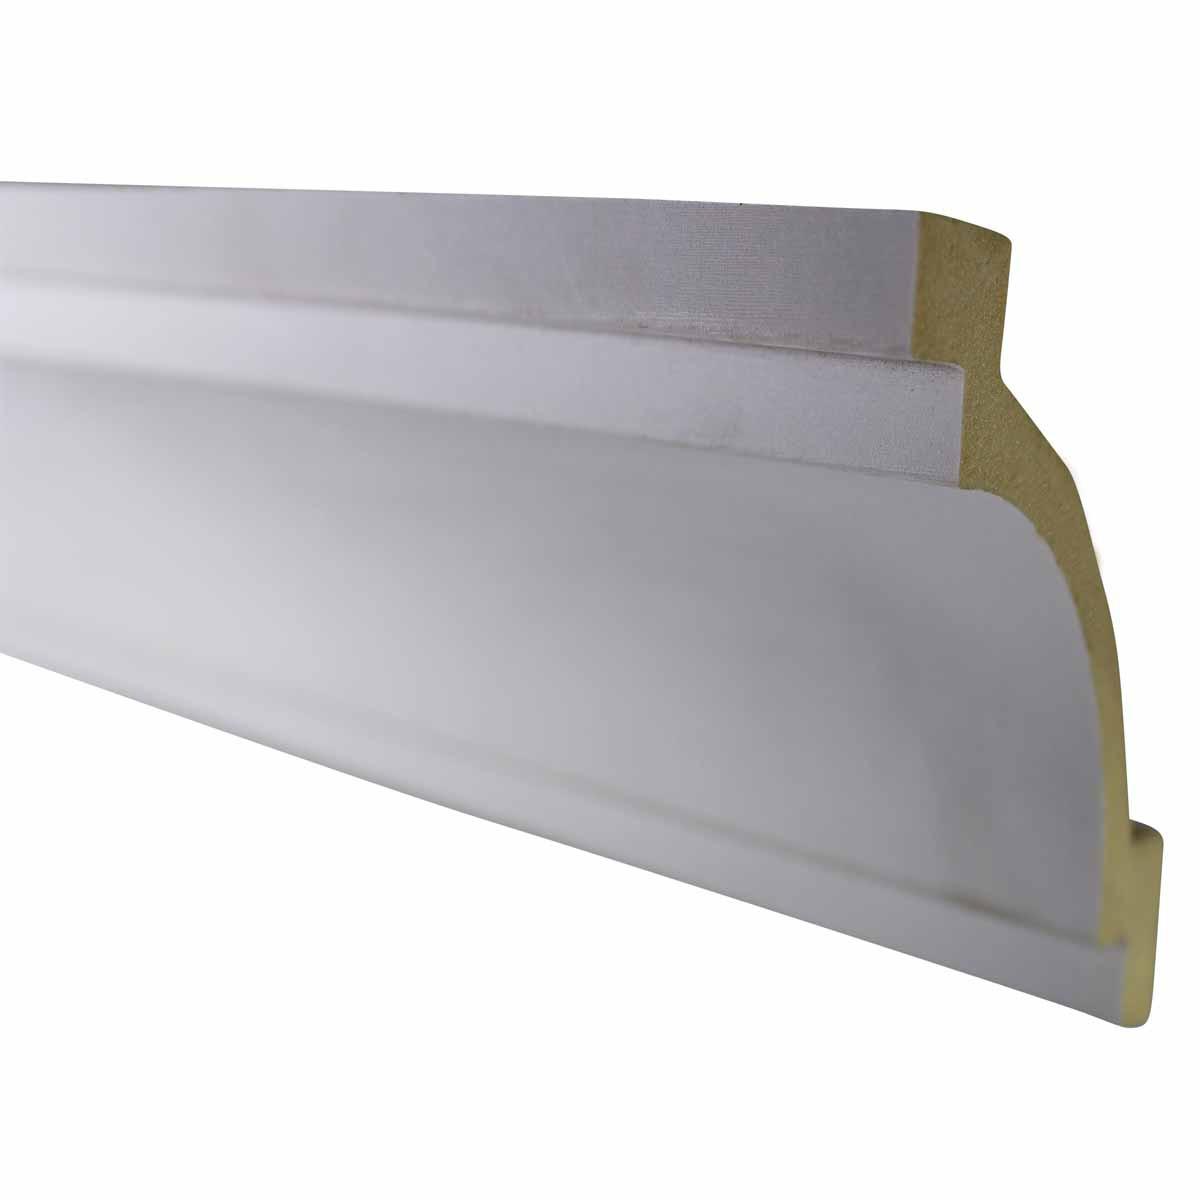 Cornice White Urethane Sample of 12411 24 Cornice Cornice Moulding Cornice Molding